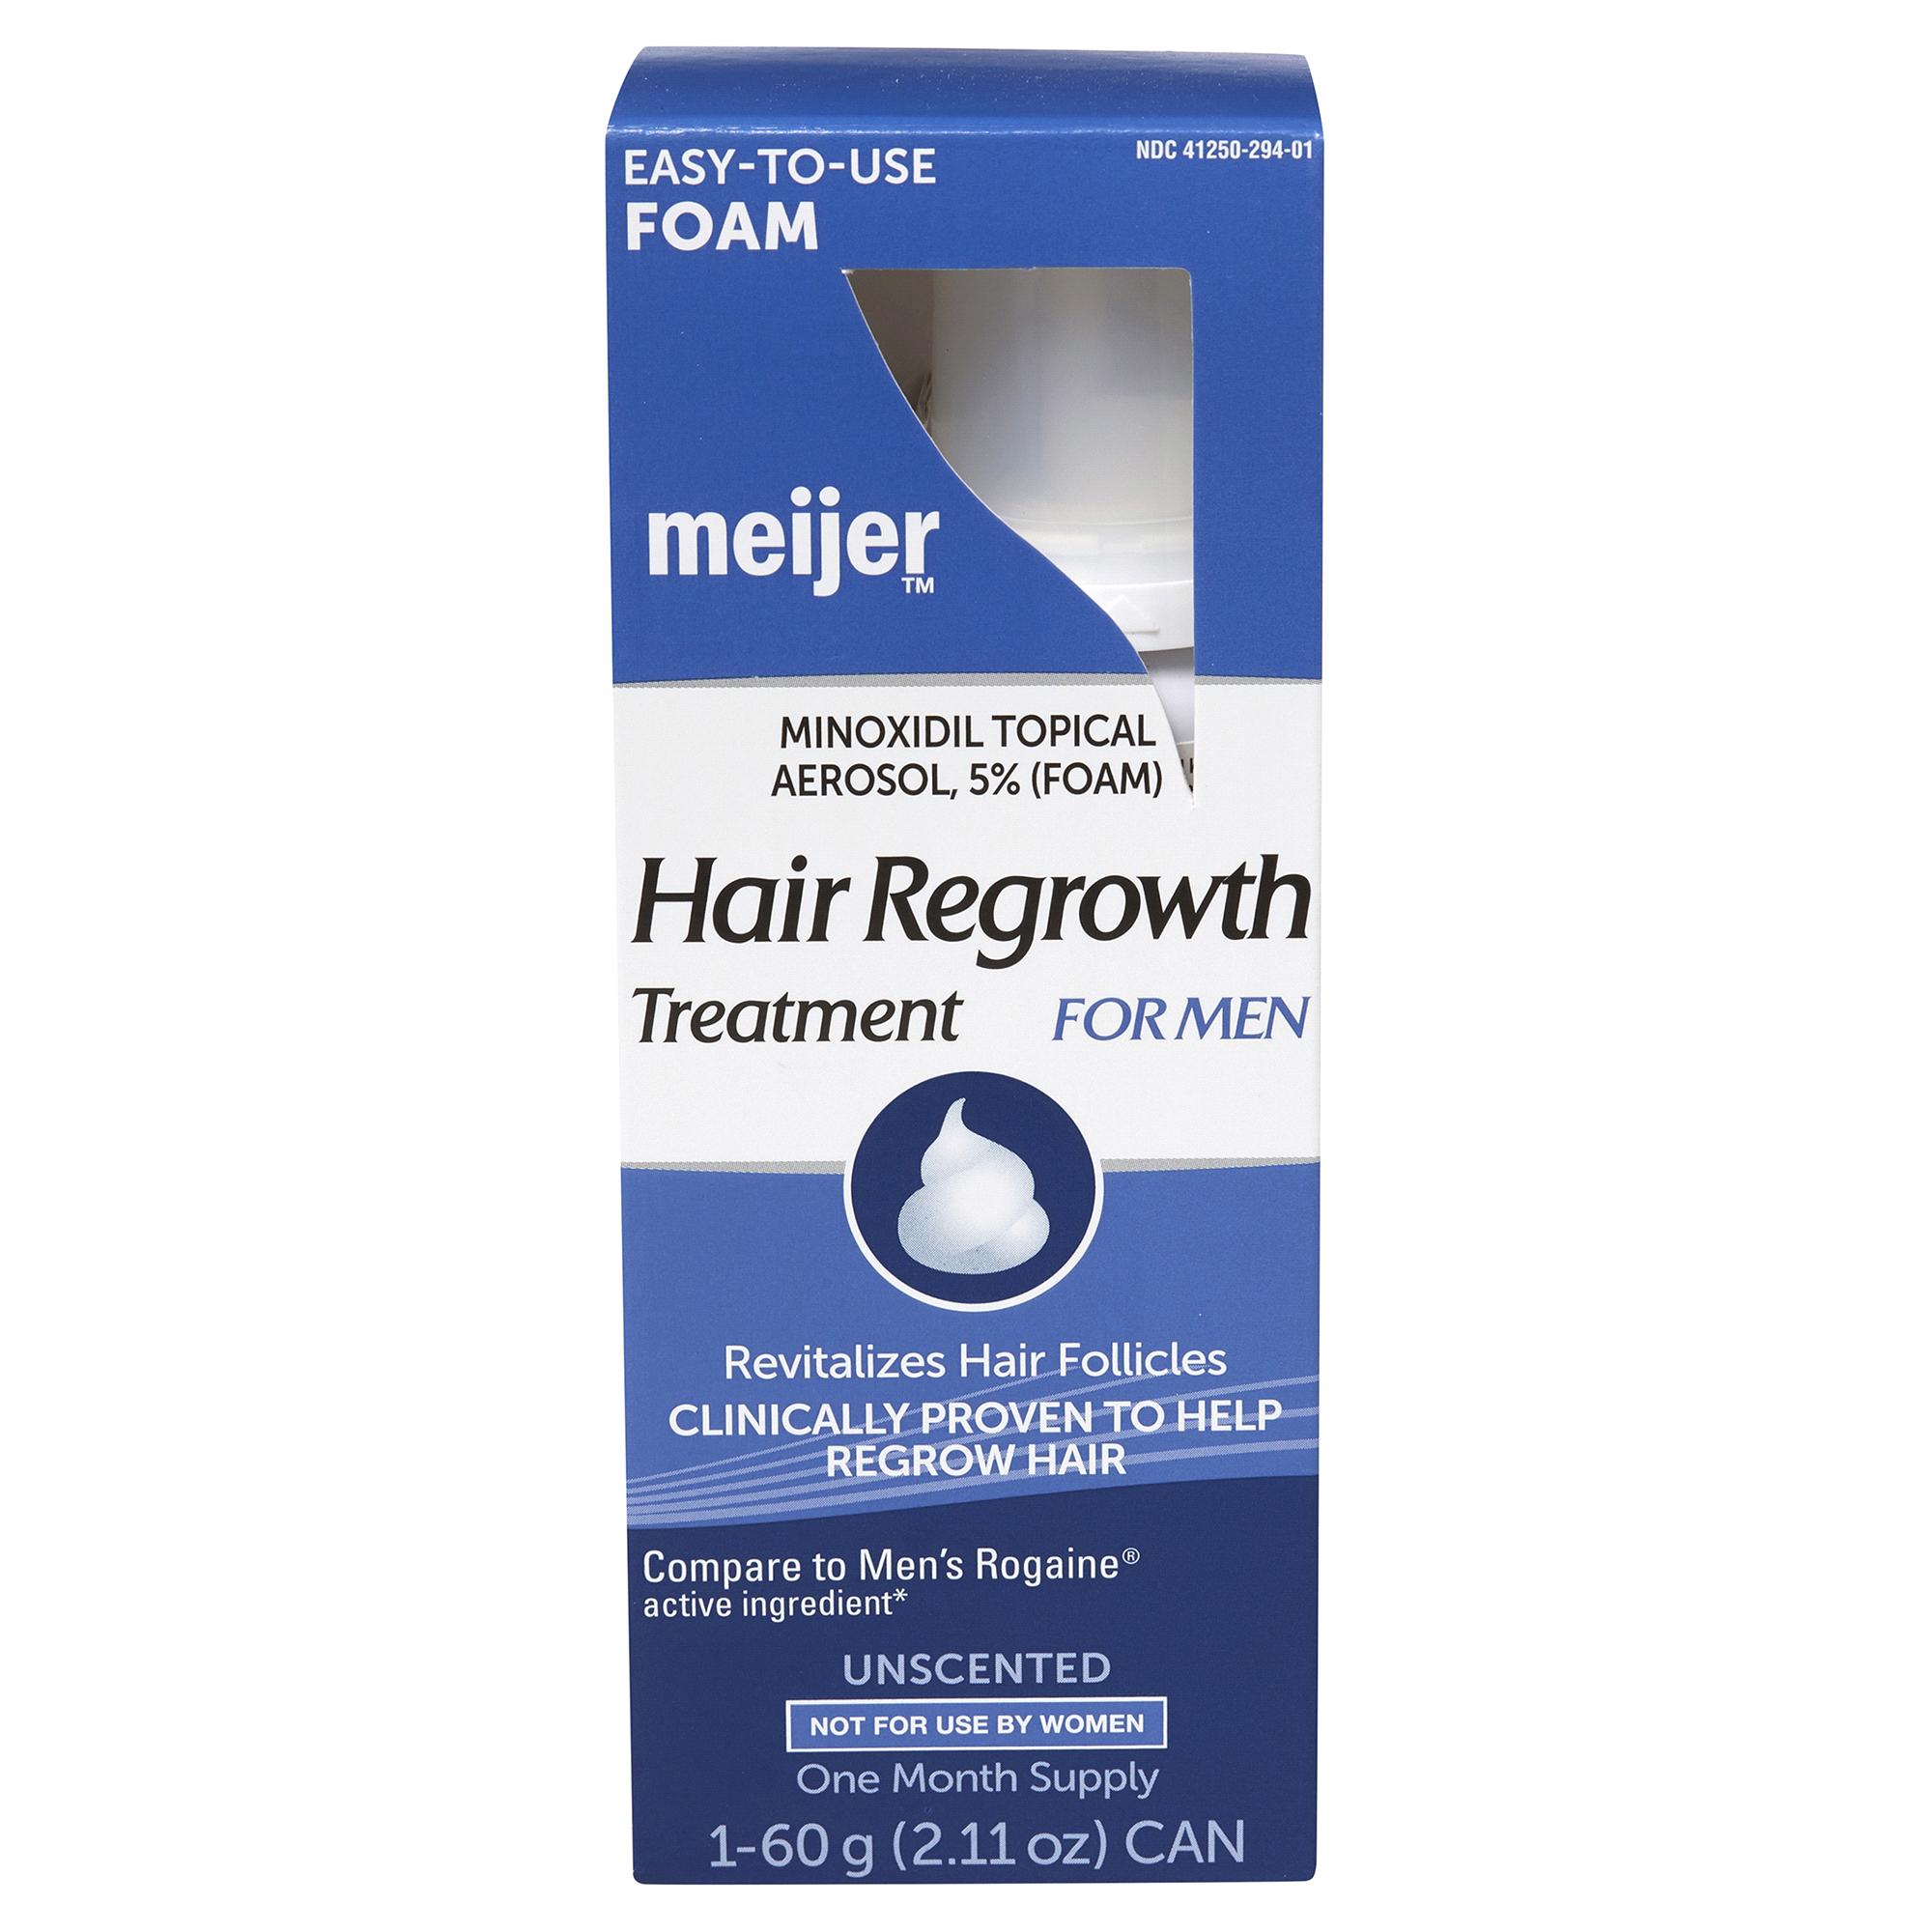 Meijer Brand Mens Minoxidil 5 30 Day Foam Rogaine Topical Aerosol